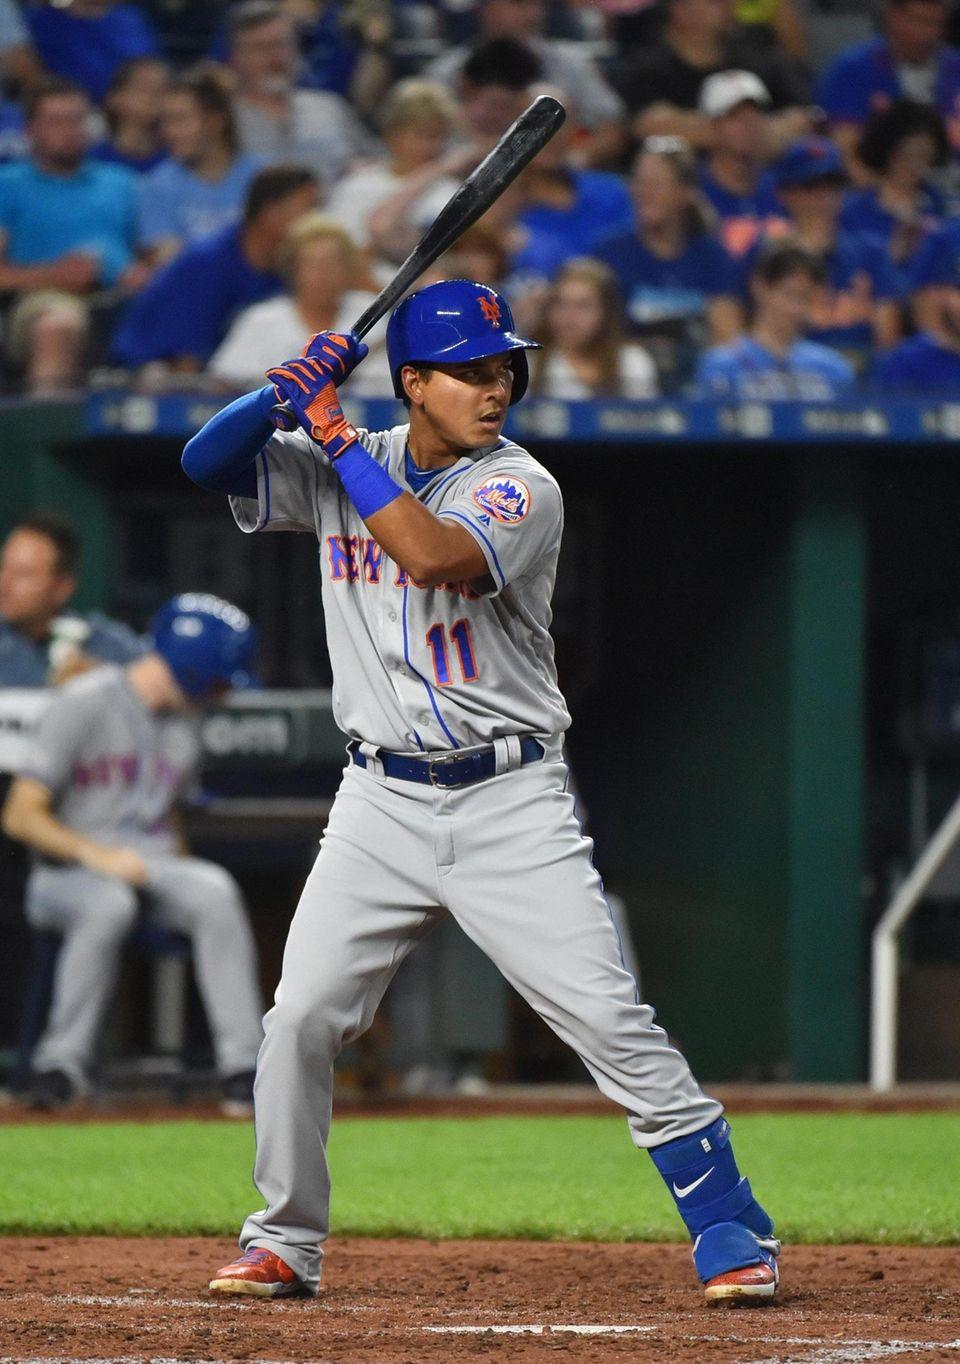 Ruben Tejada #11 of the New York Mets